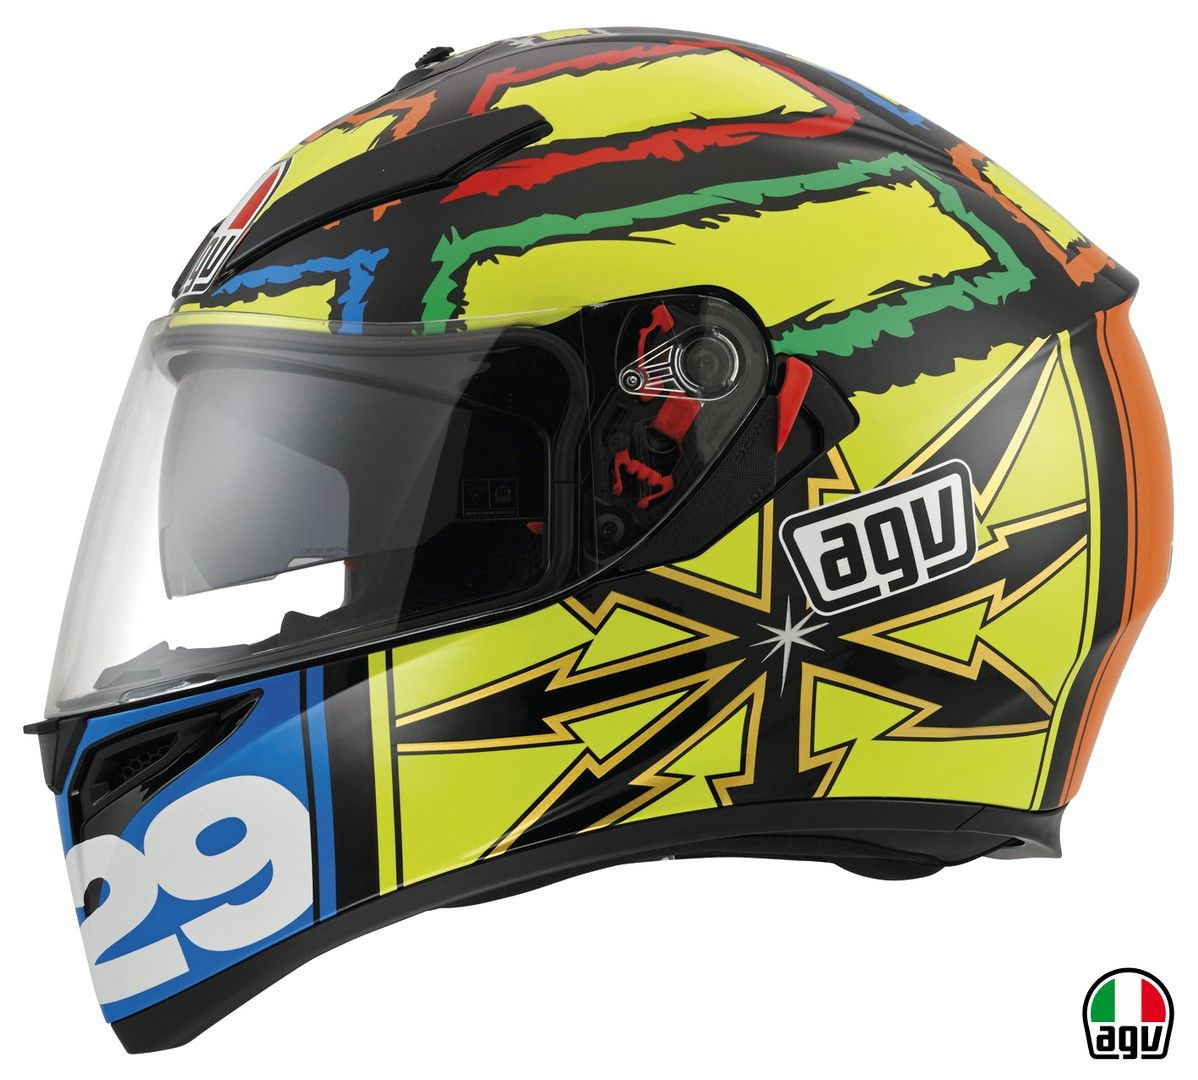 Agv K 3 Sv Iannone Helmet Design Helmet Motorcycle Helmets